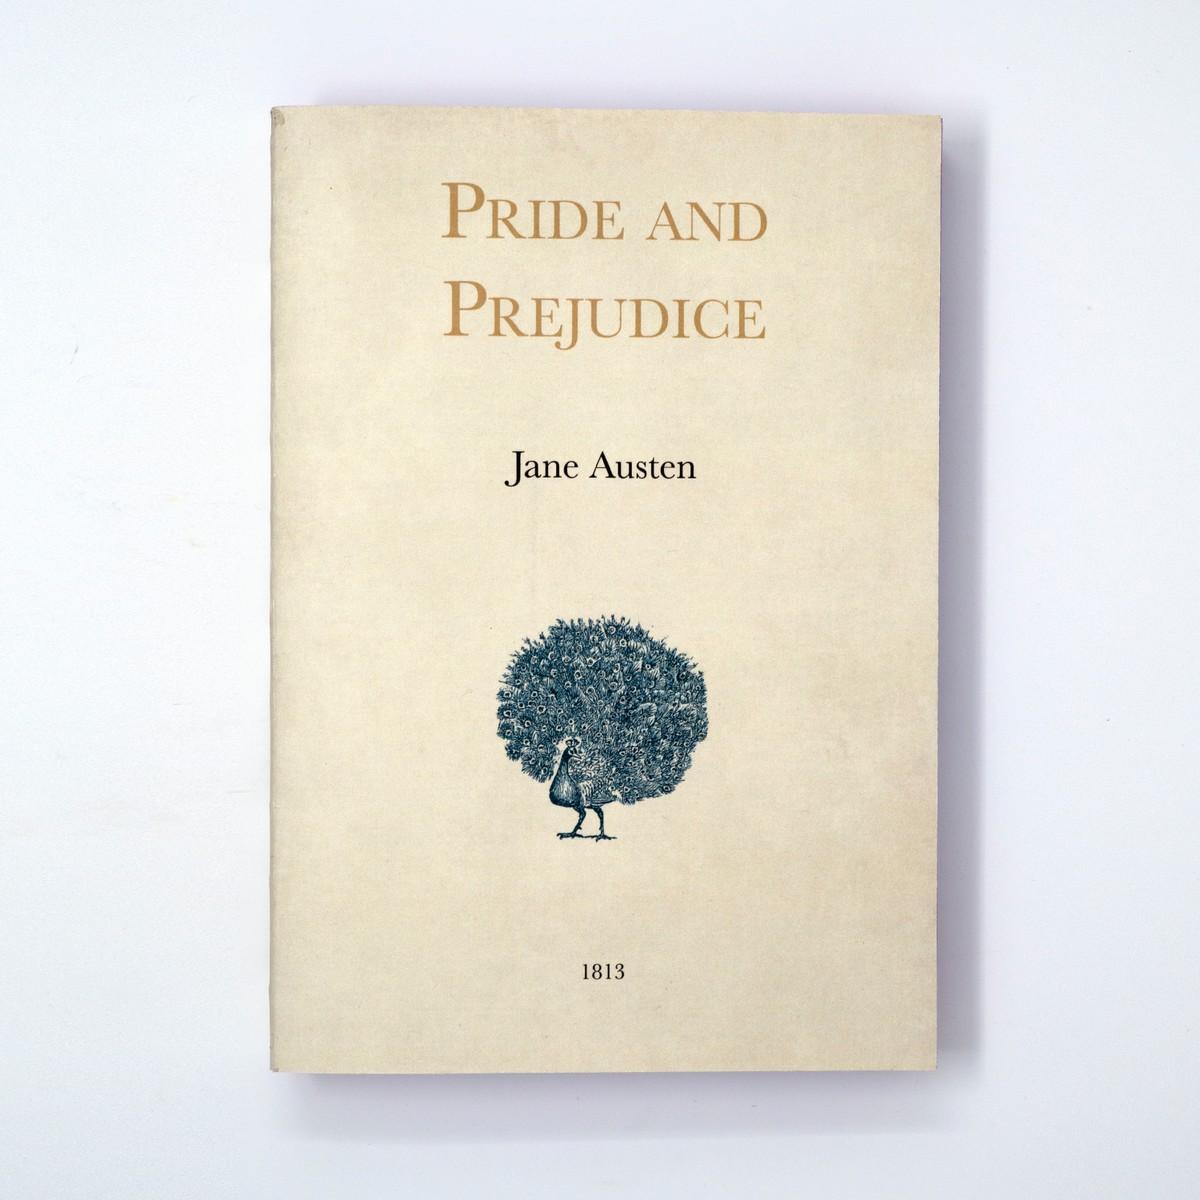 Photo of Pride and Prejudice Notebook